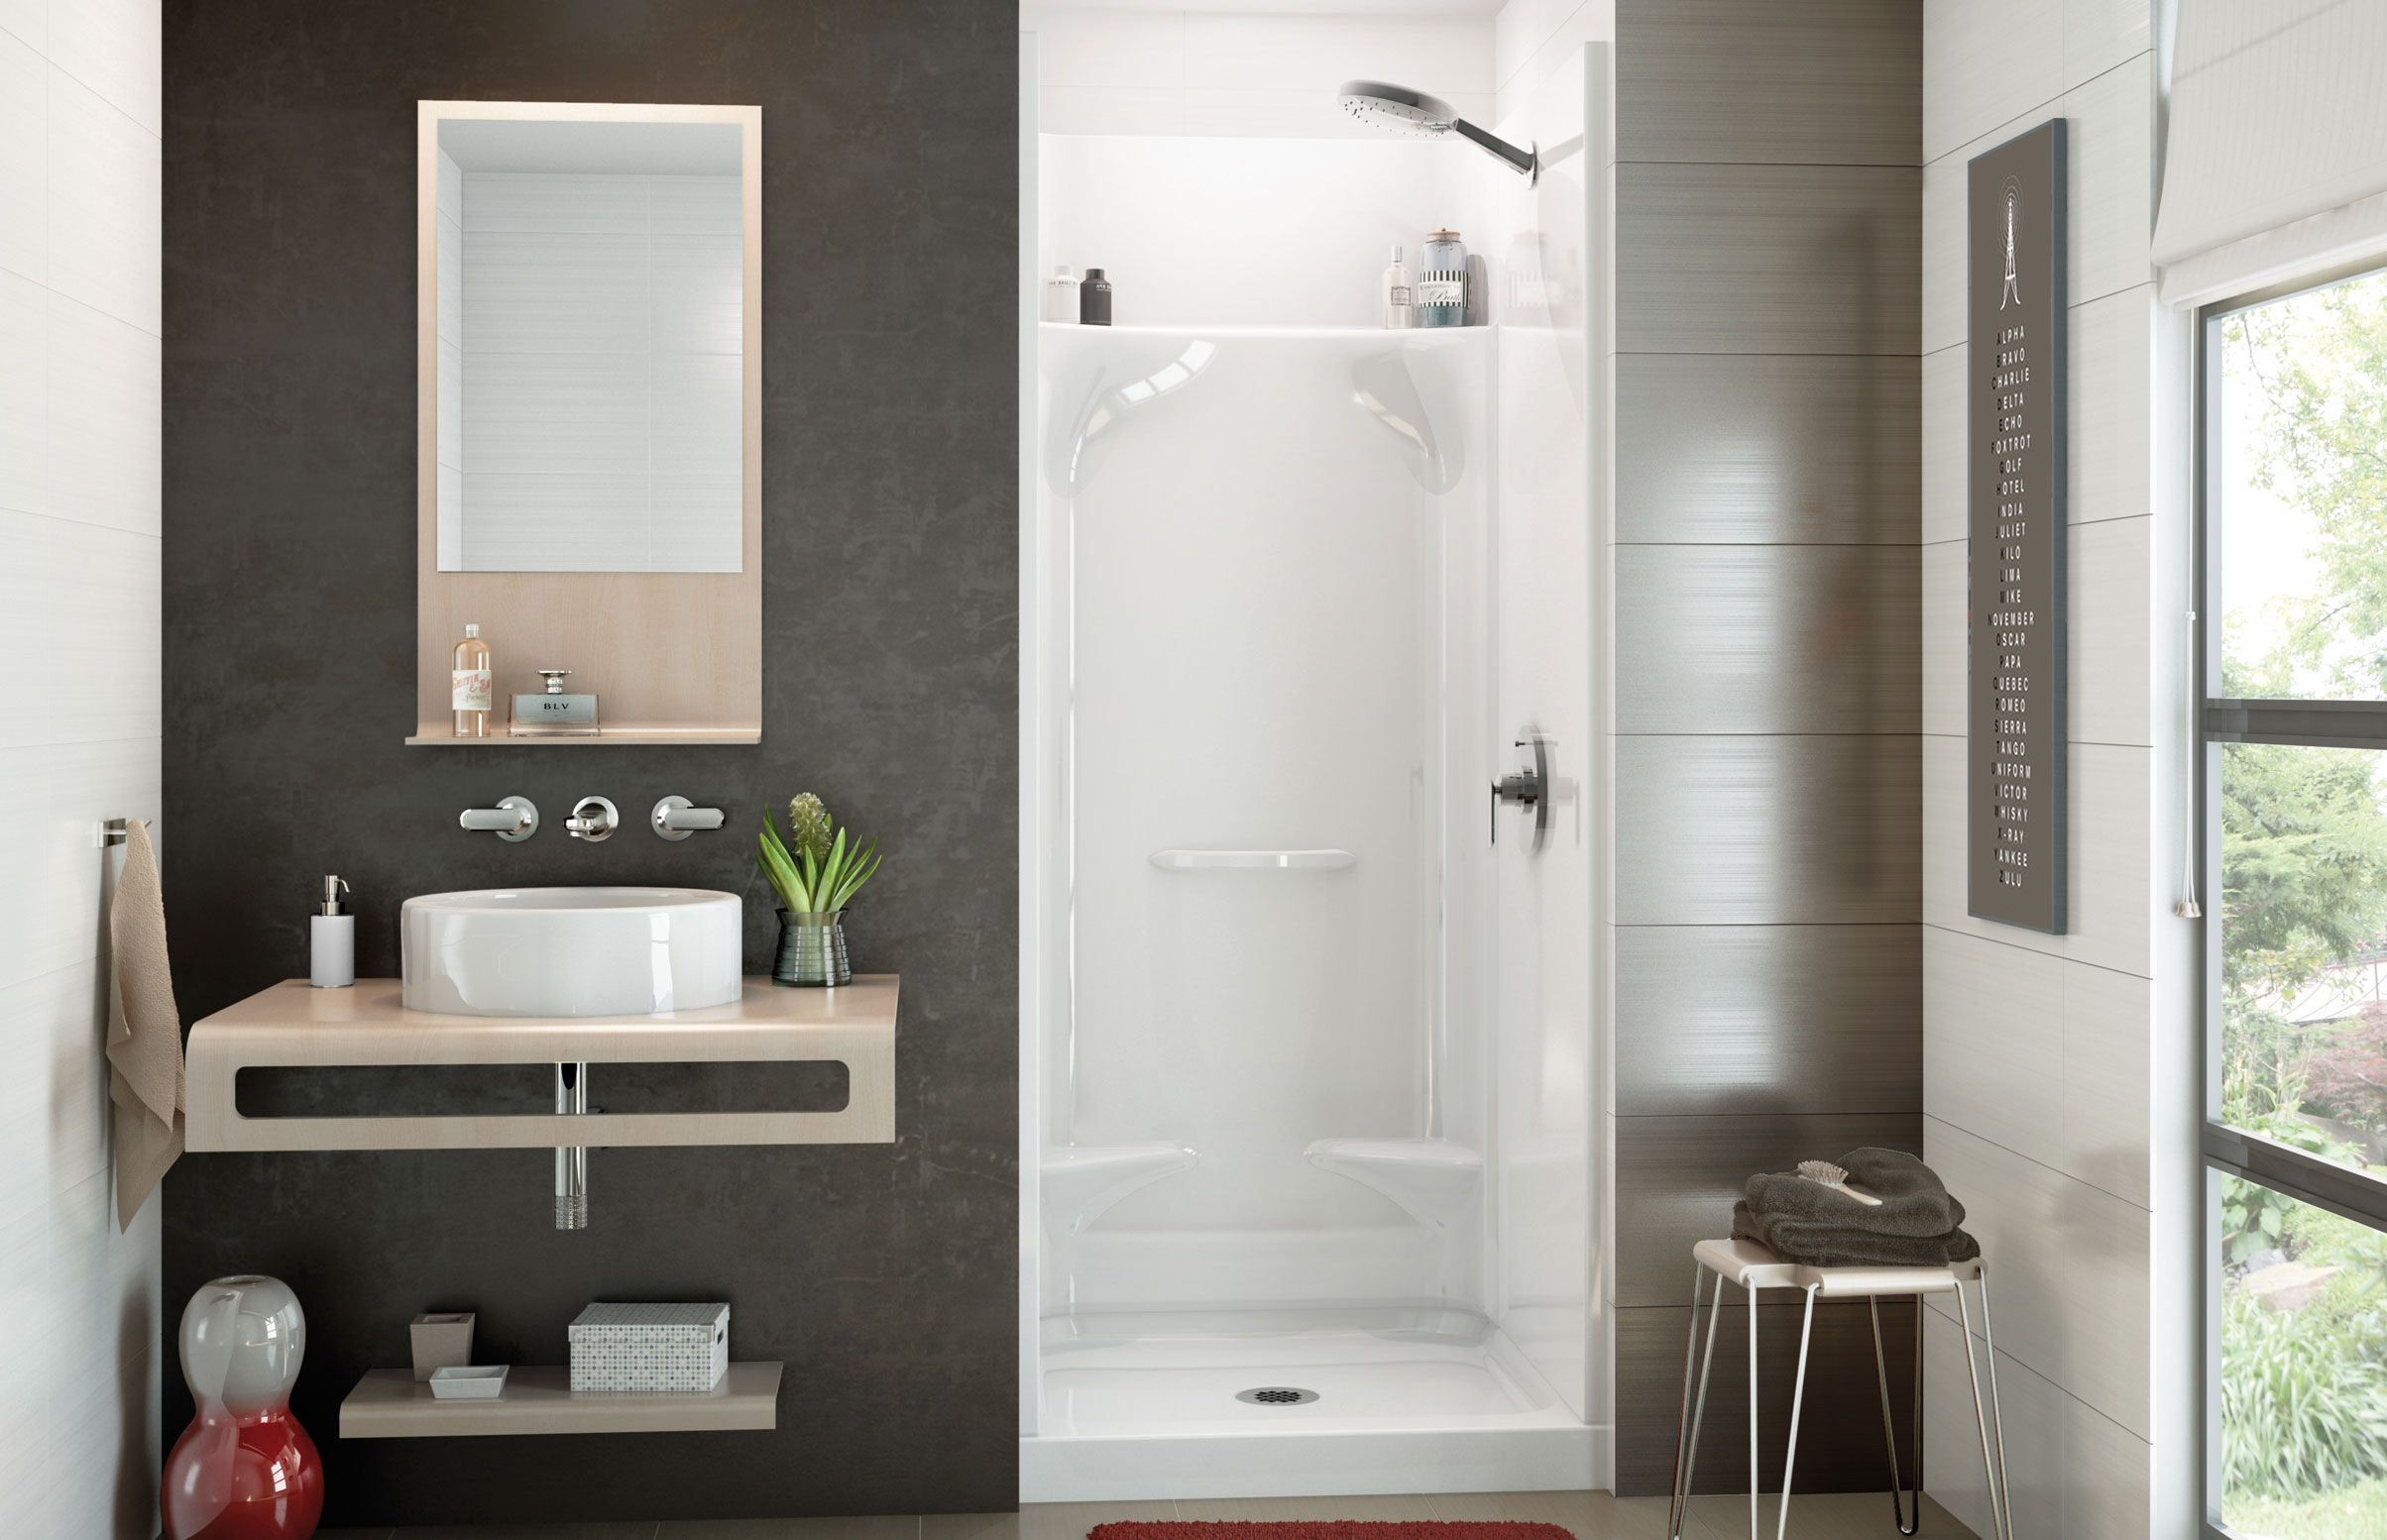 Essence Sh 3232 Alcove Showers Maax Bath Inc For